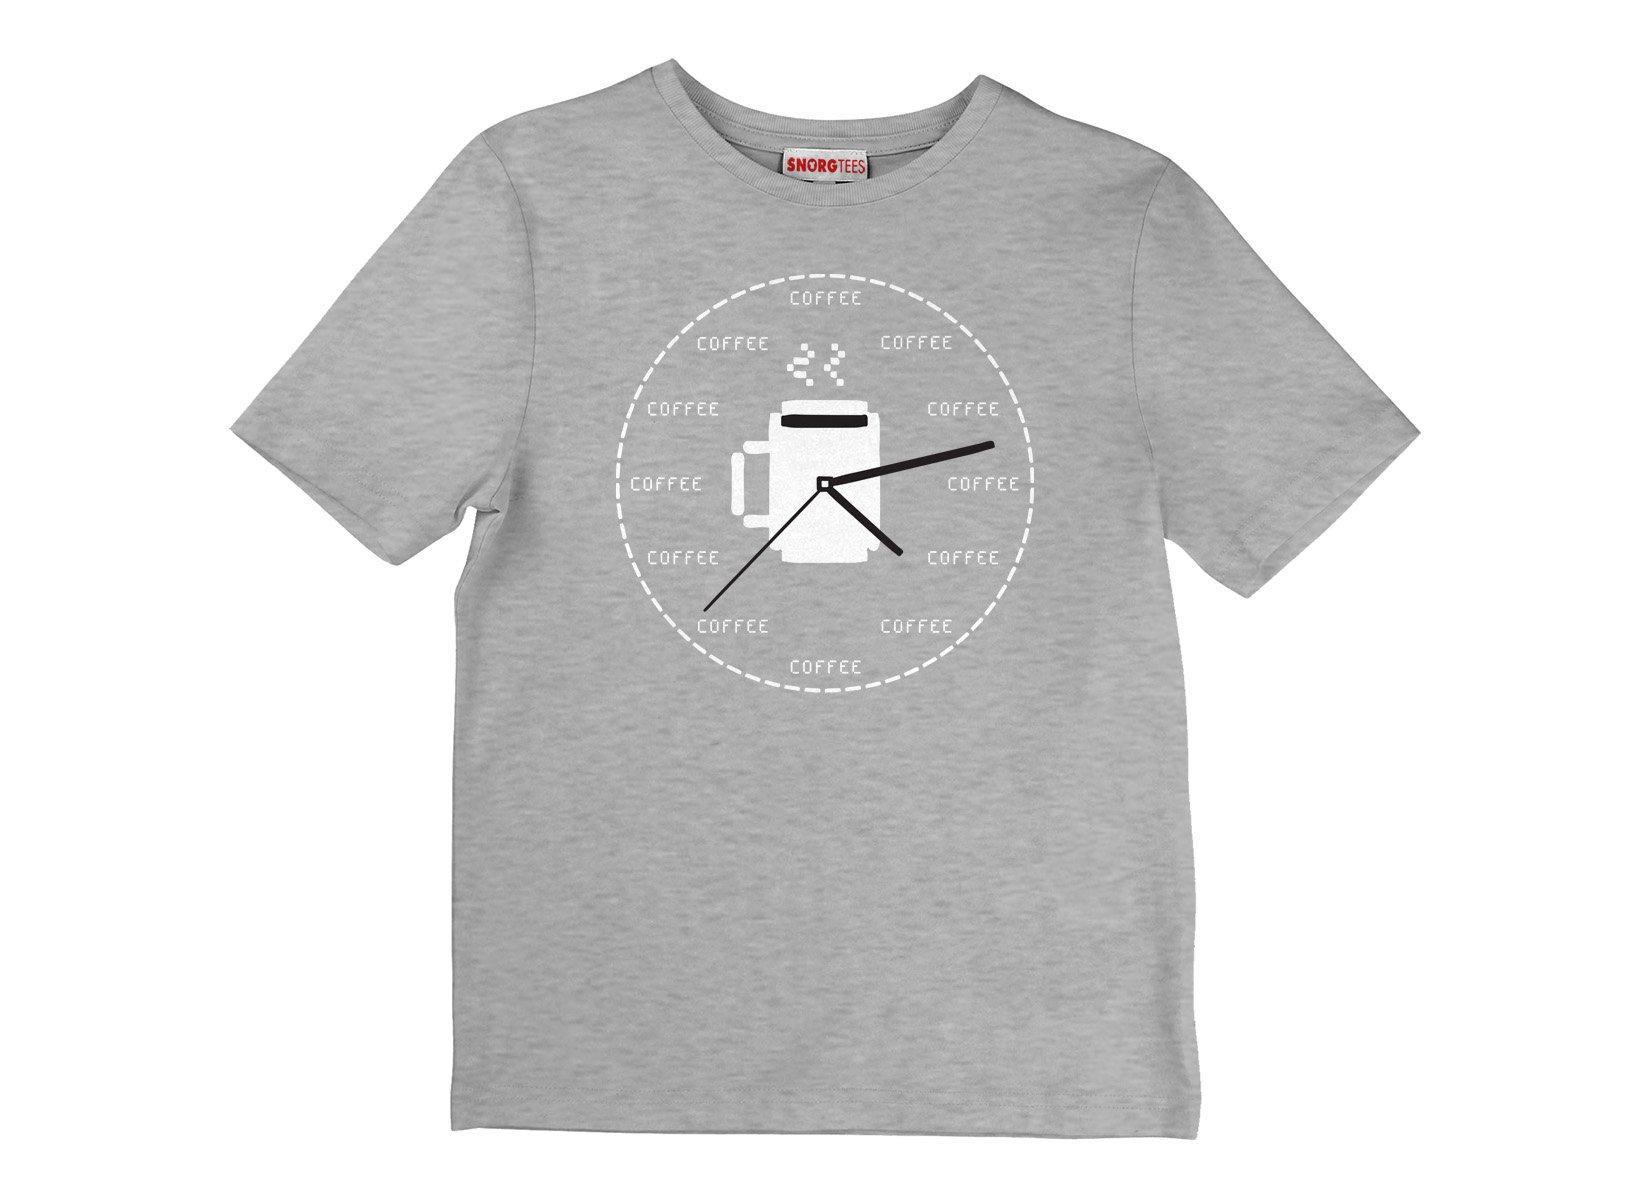 Coffee O'Clock on Kids T-Shirt